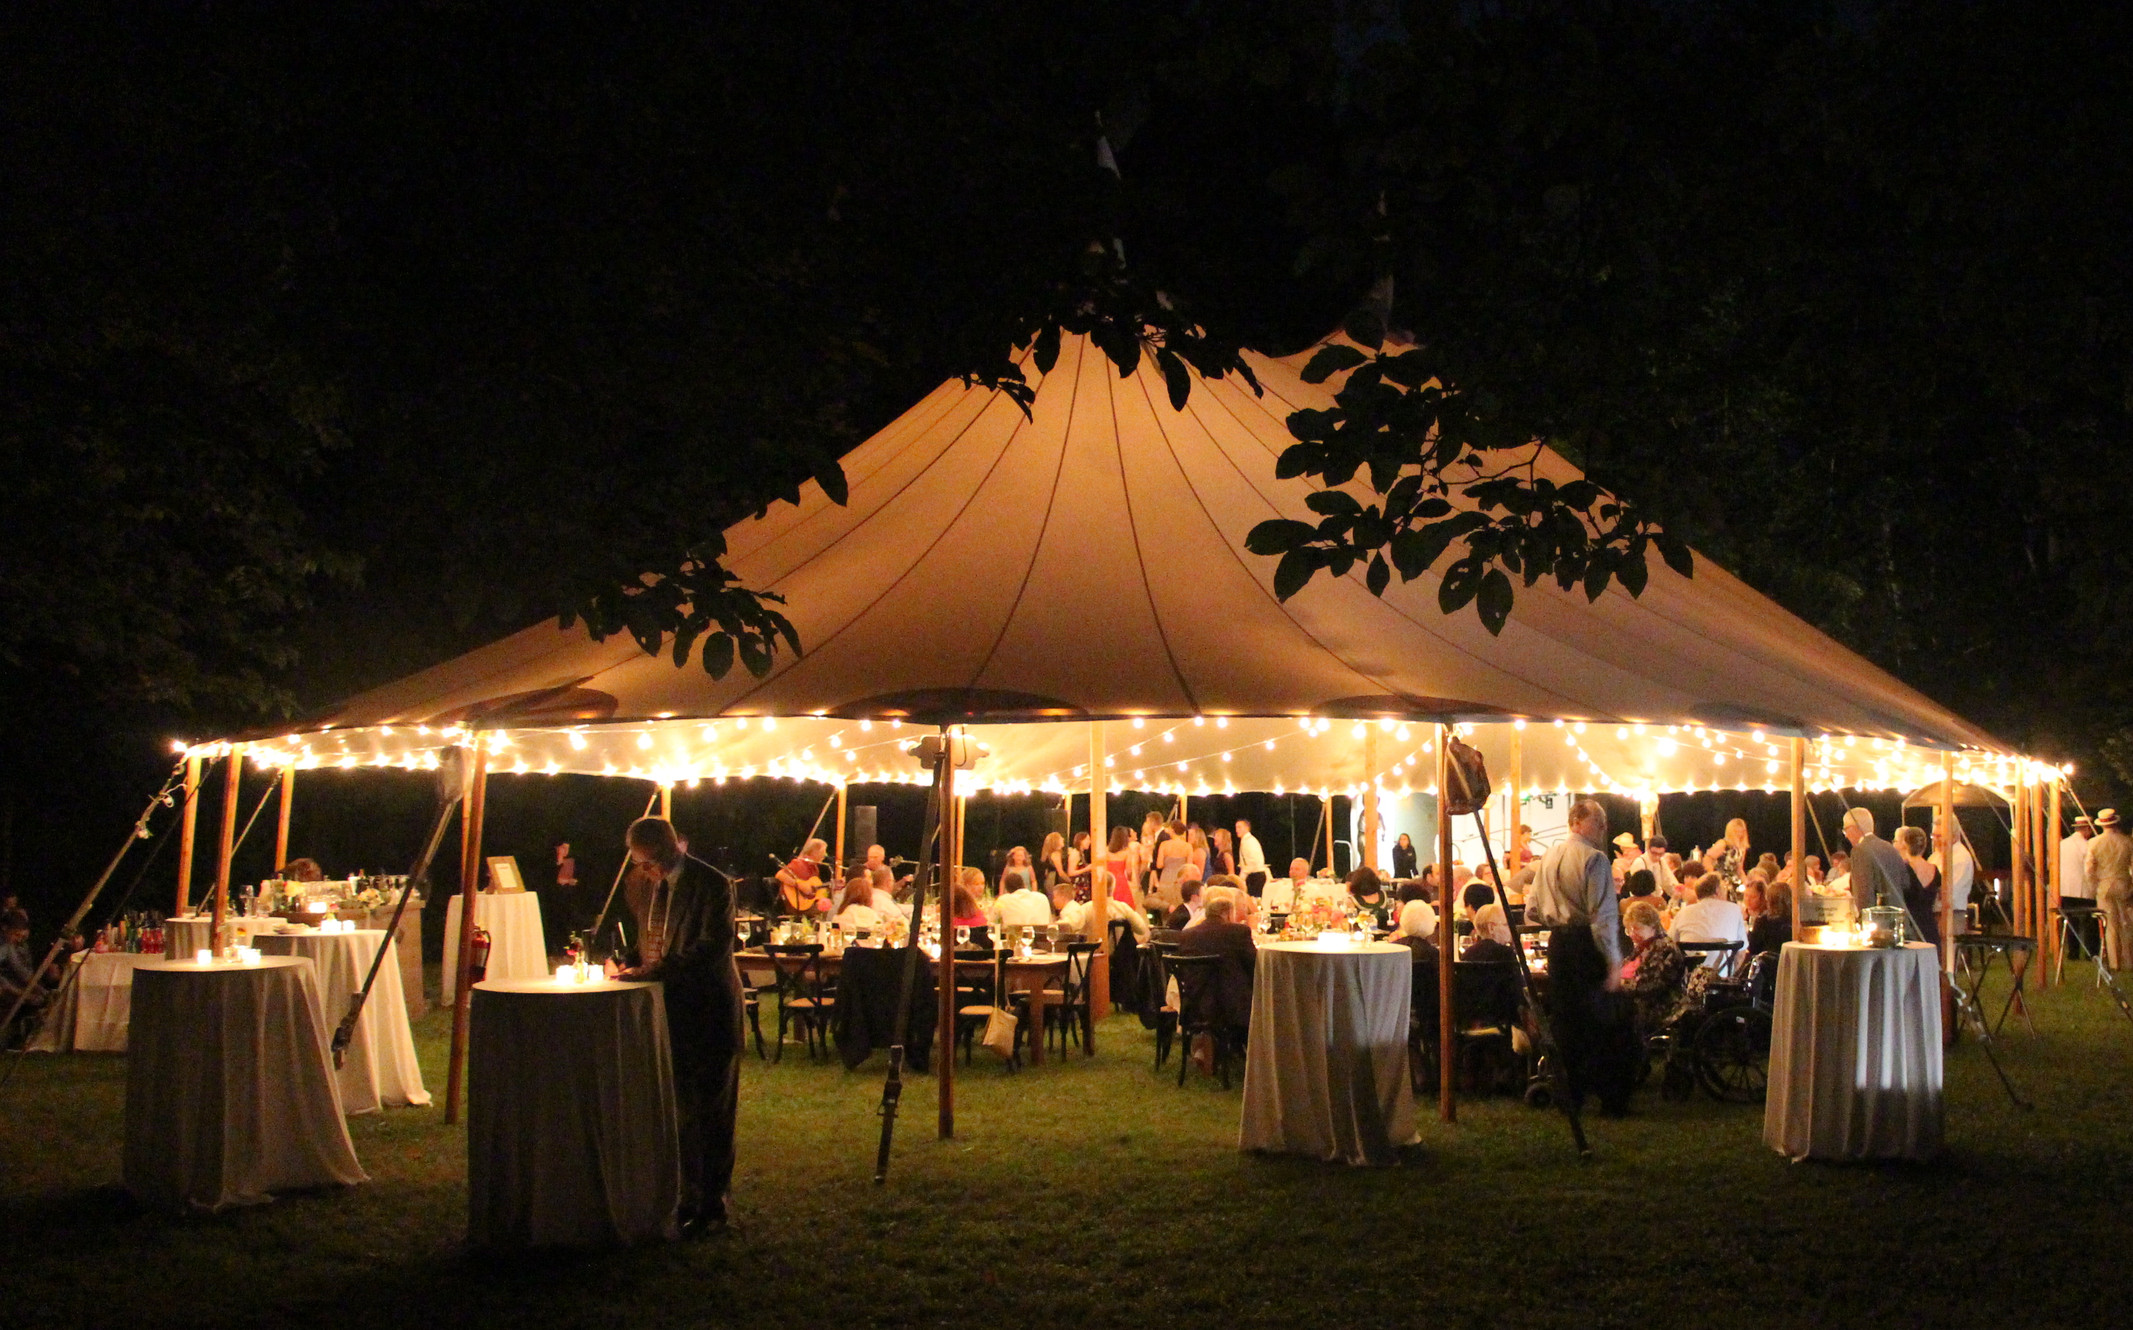 Blog | Estoccasions Connecticut Wedding Planning